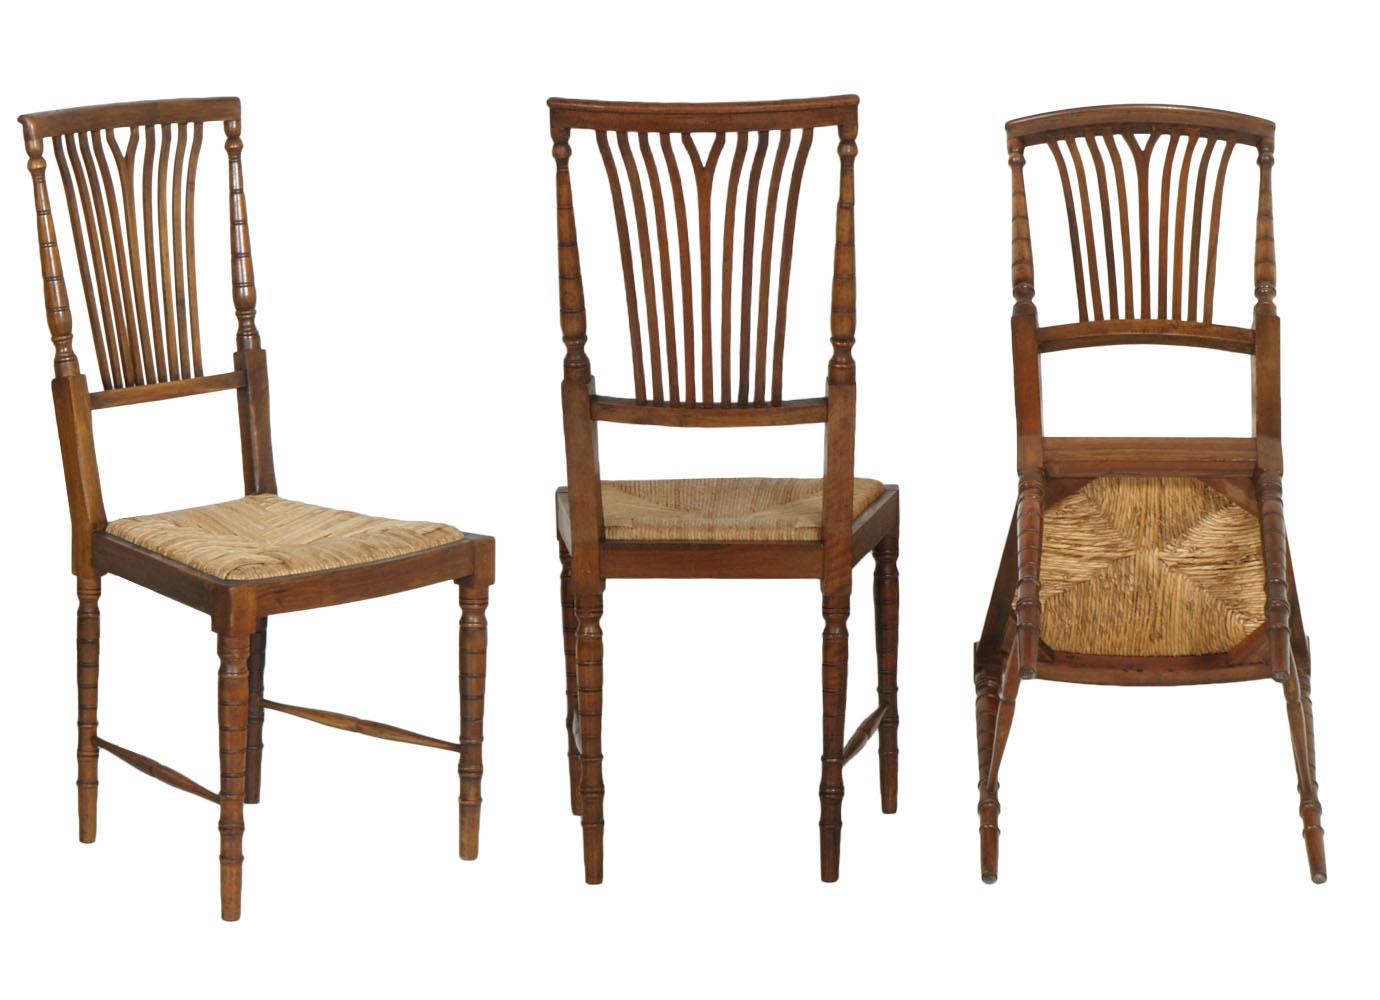 6 sedie set strong chairs chiavari leggere luigi xvi noce - Sedie capotavola ...